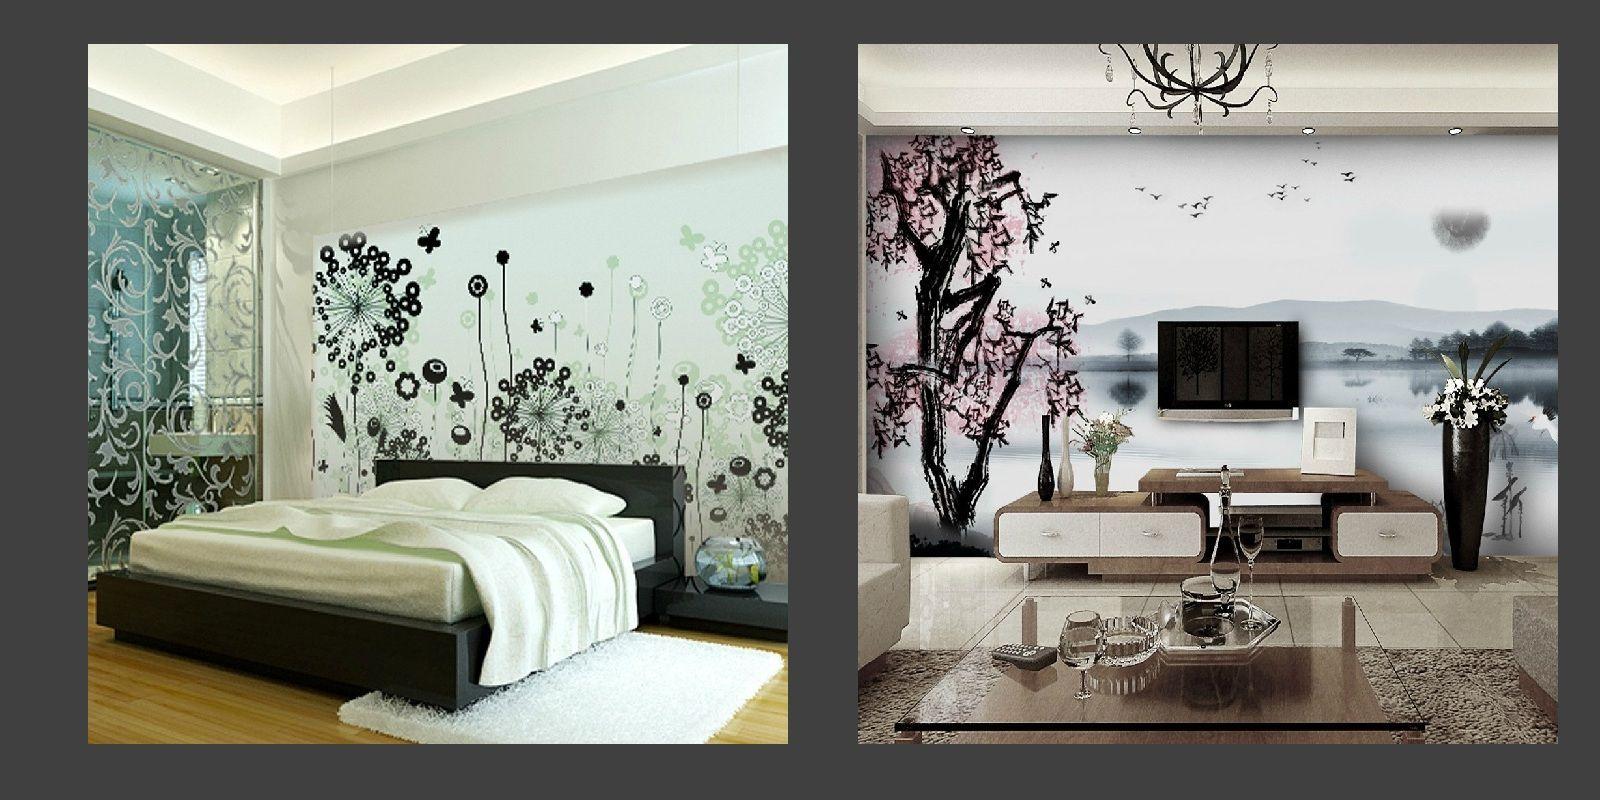 wallpaper interior design india photo - 10